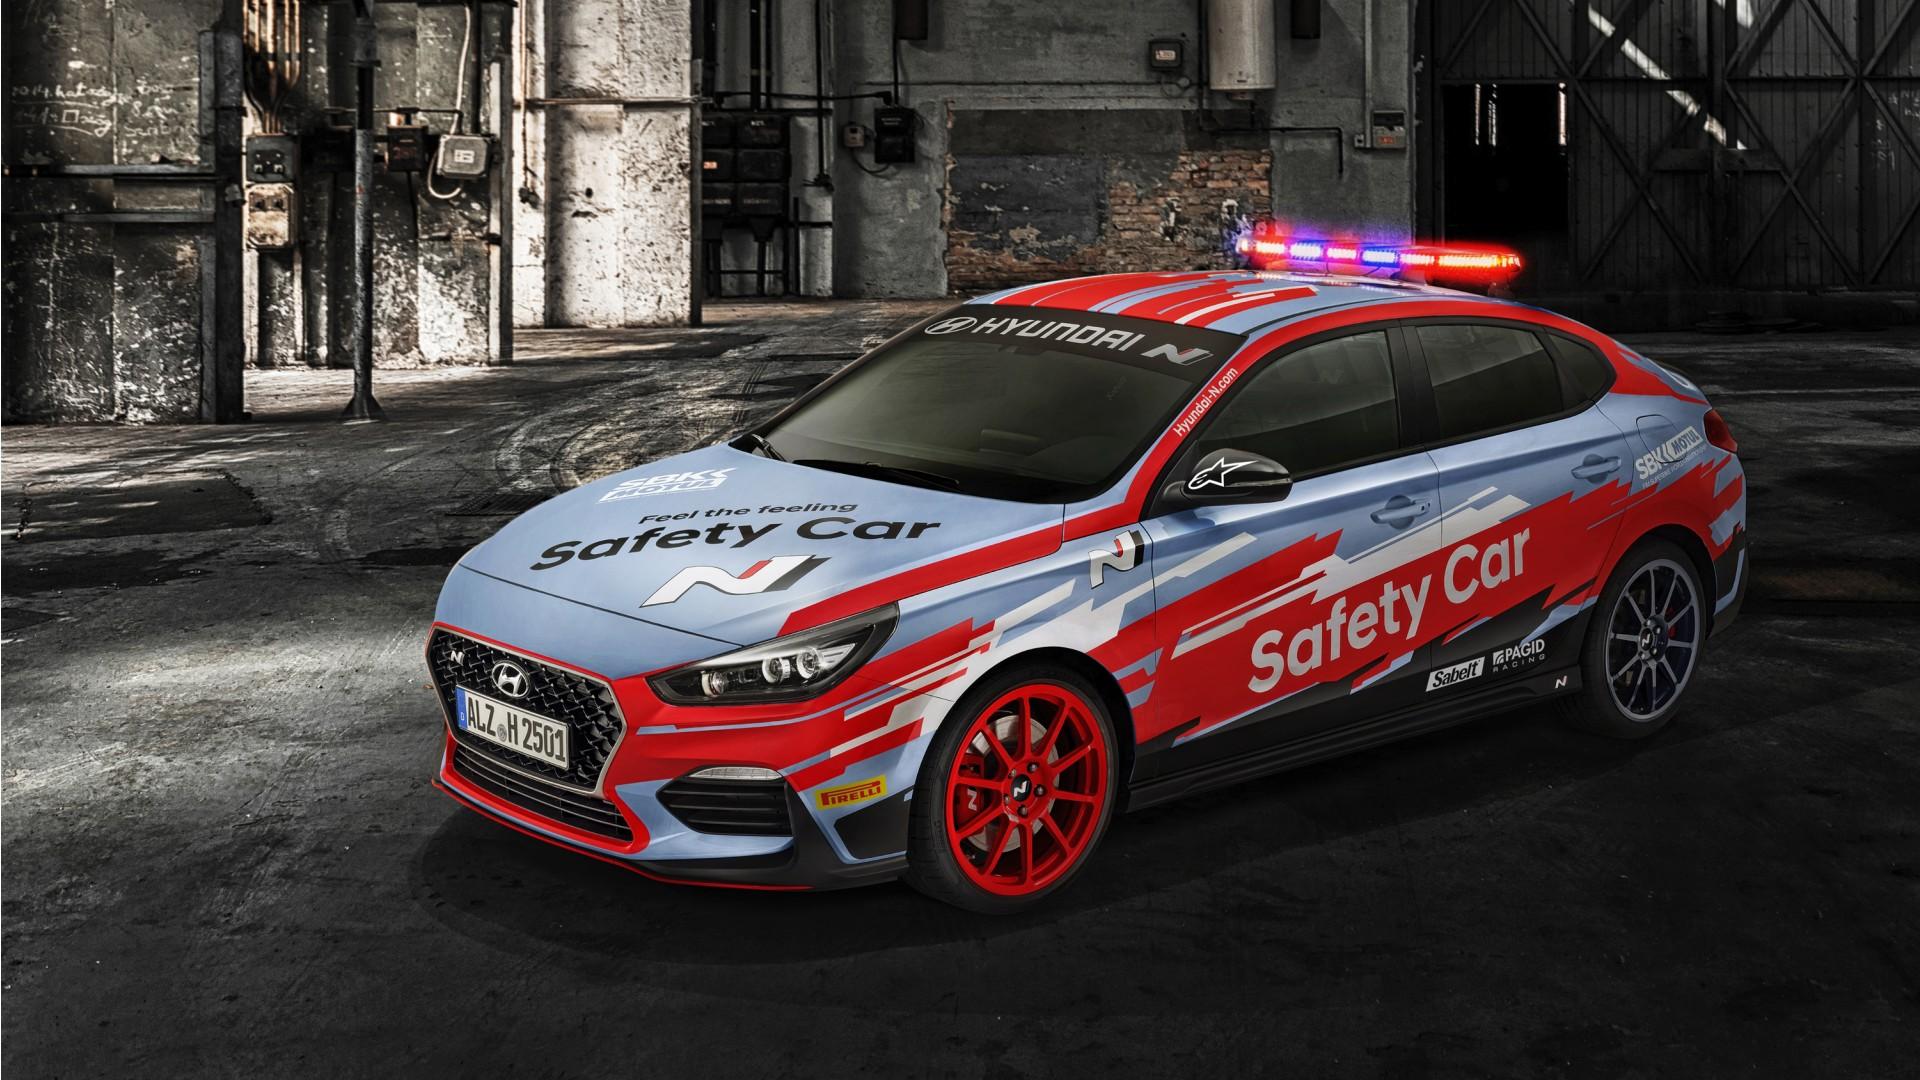 2019 Cars: Hyundai I30 Fastback N SBK Safety Car 2019 Wallpaper